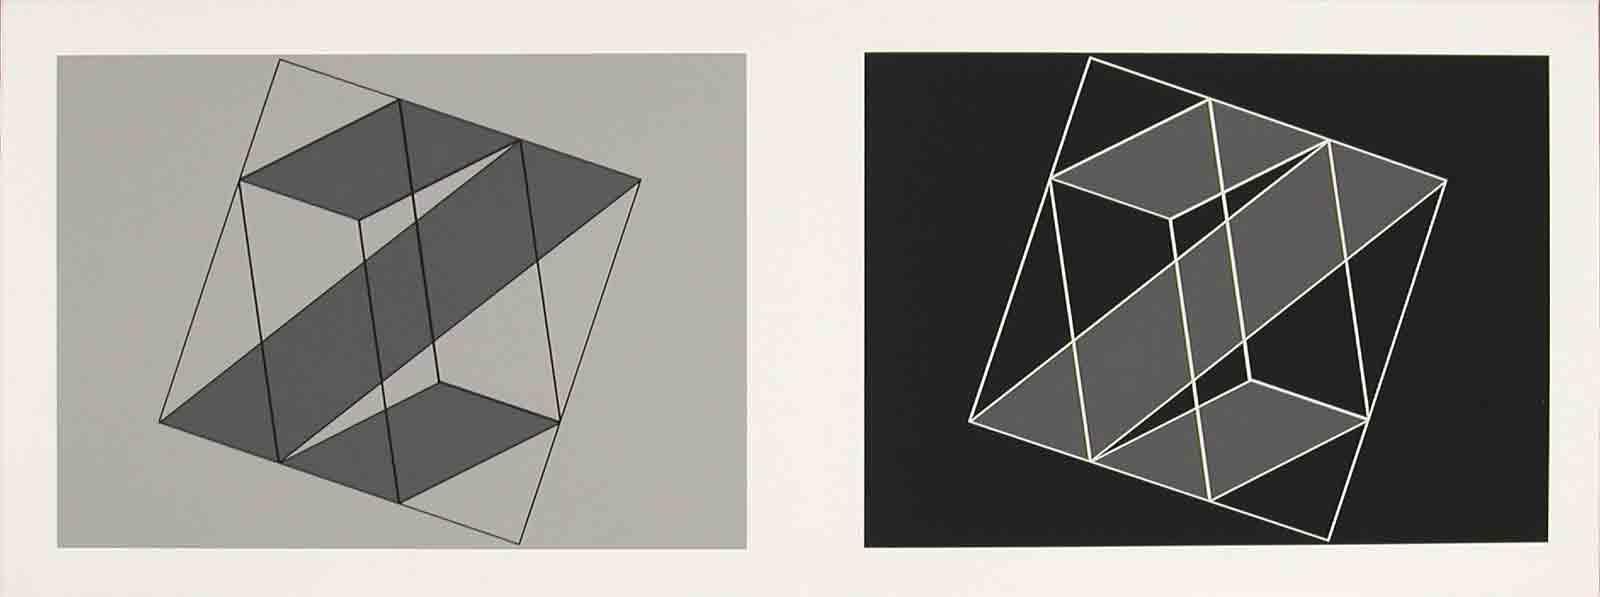 Josef Albers, Formulation : Articulation, Folio II, Folder 16